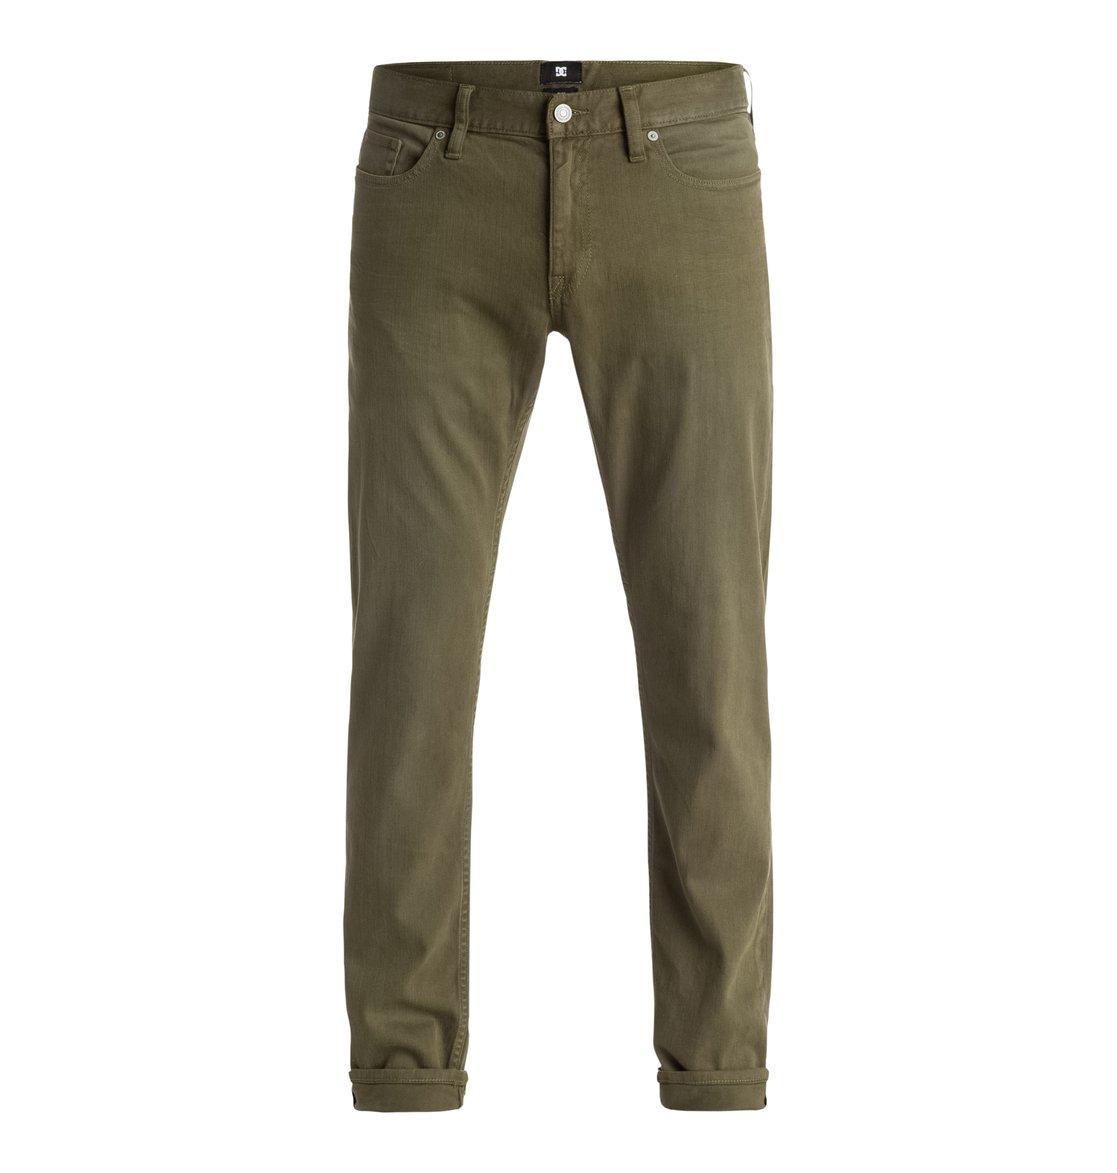 9441dc4b Mens Colored Dress Jeans | Saddha